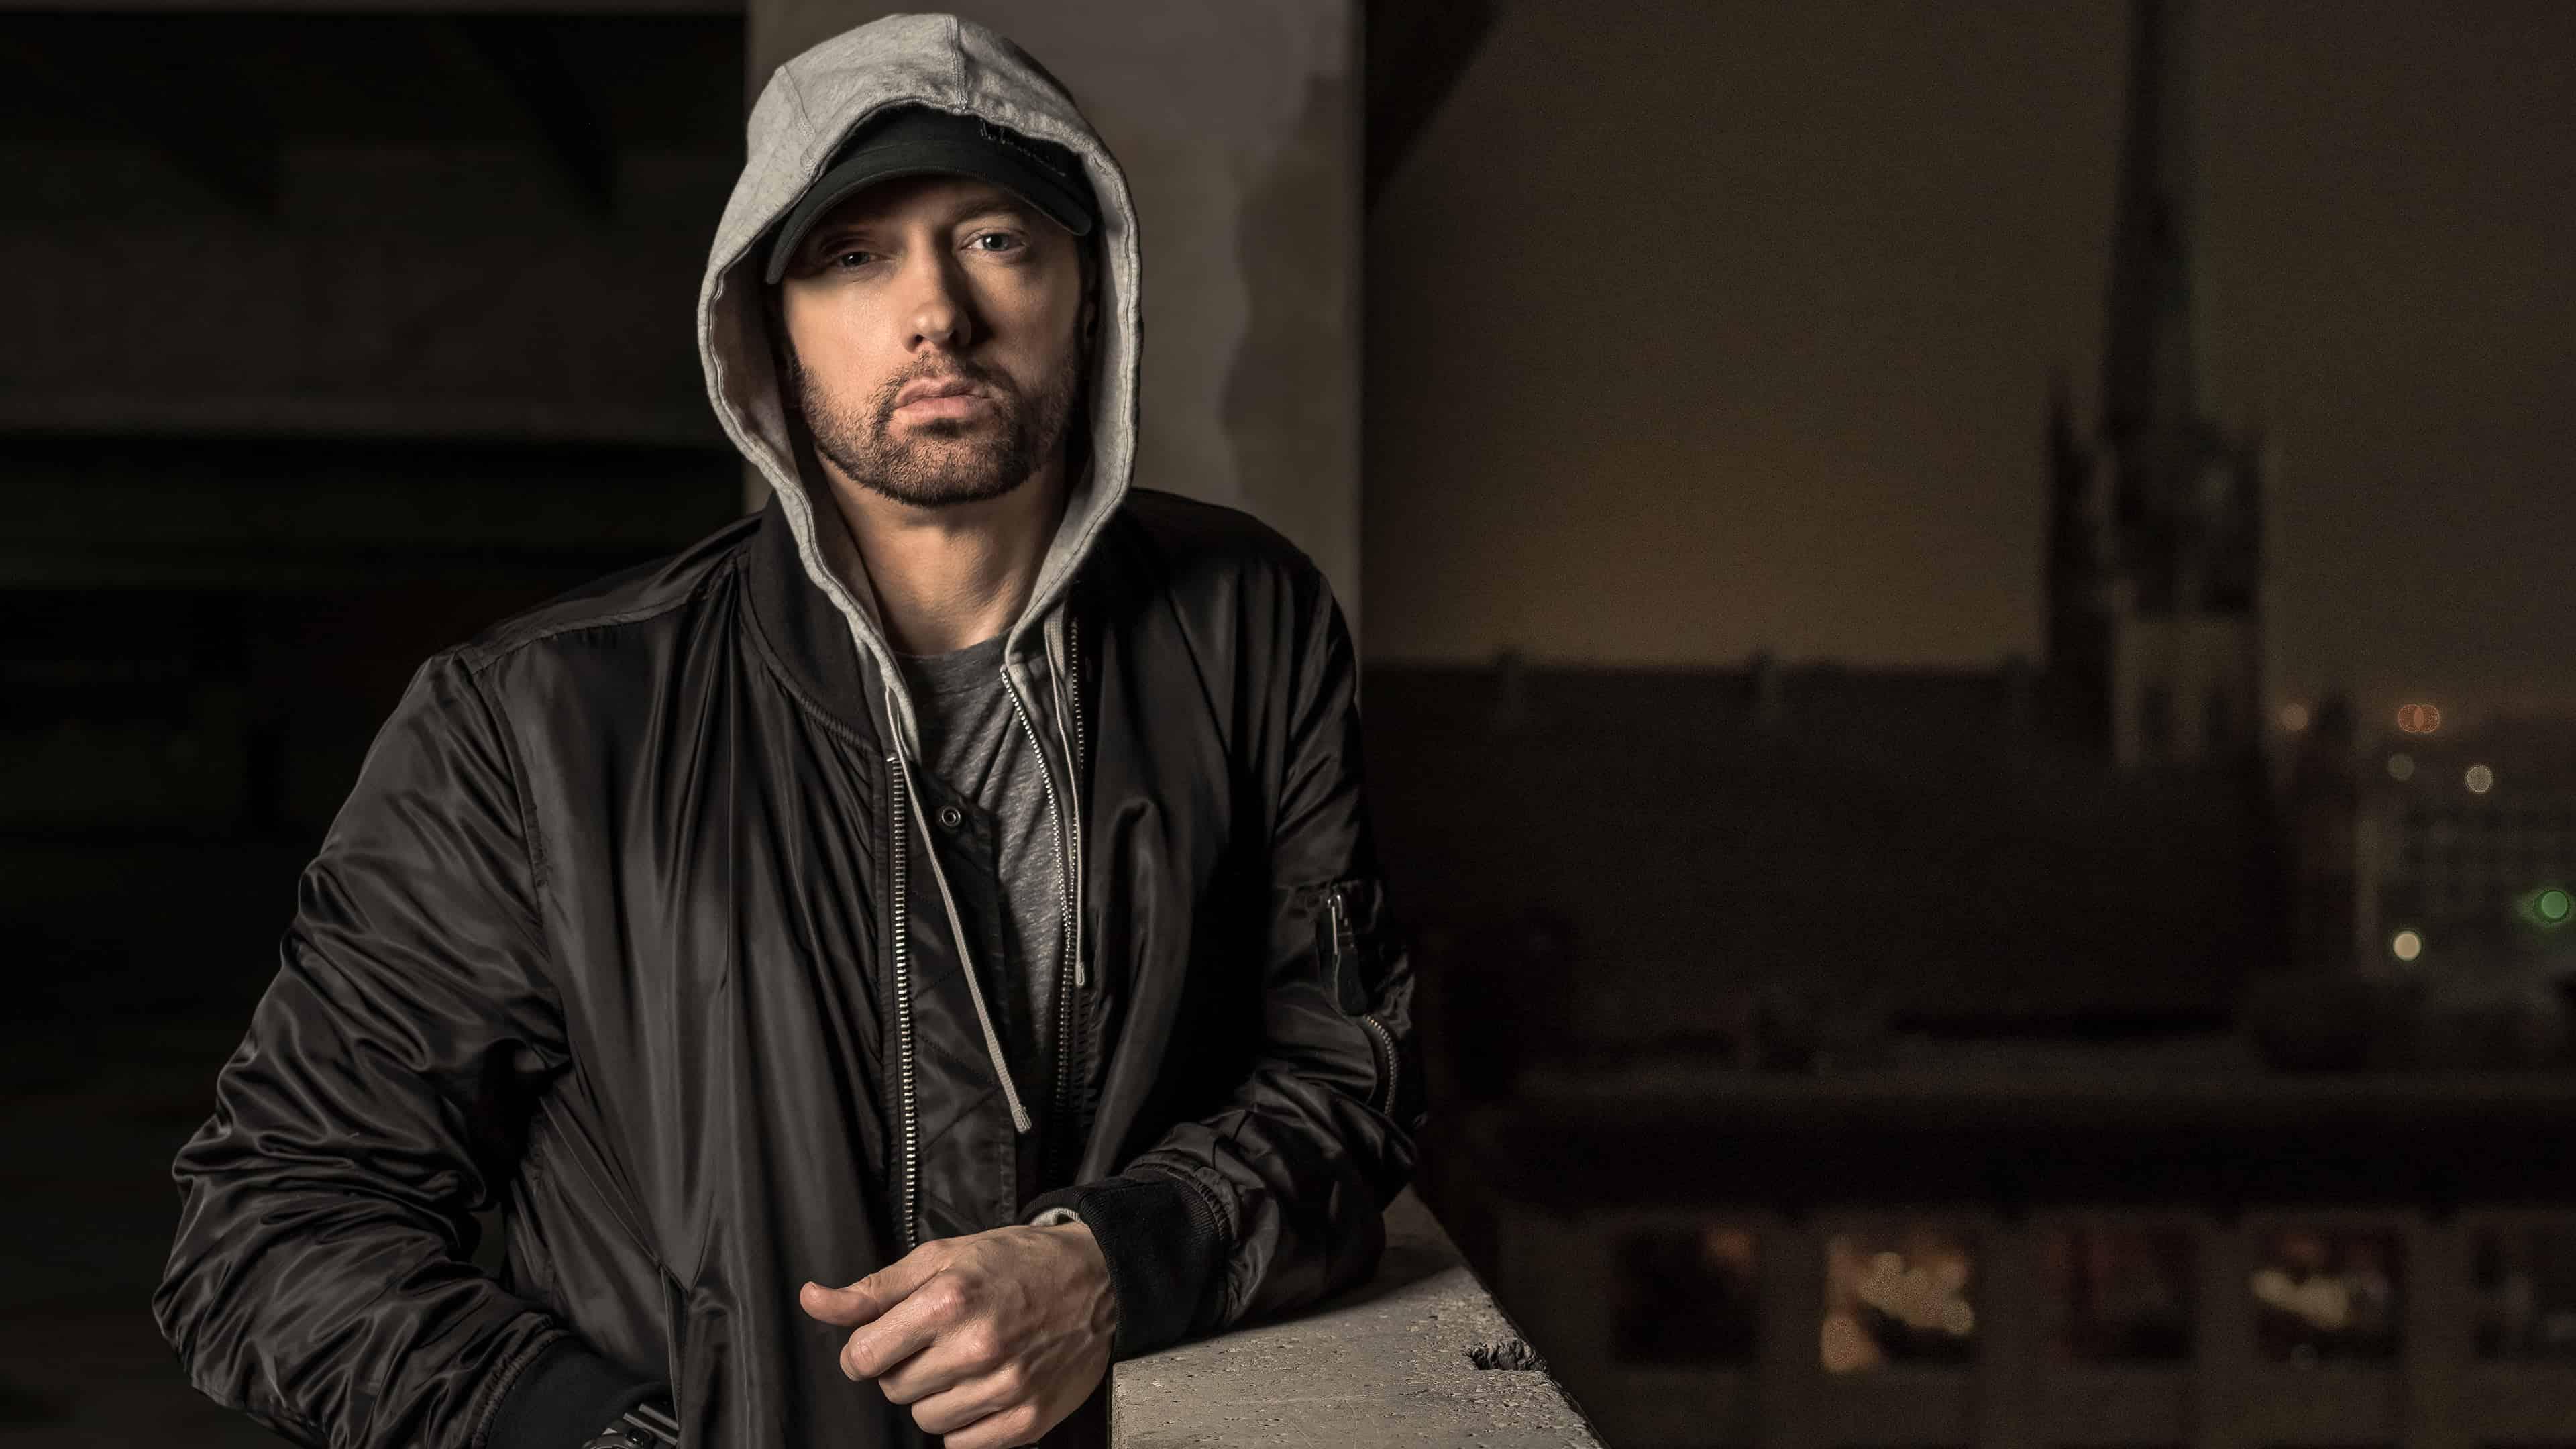 Eminem Wallpapers High Definition Festival Wallpaper 3840x2160